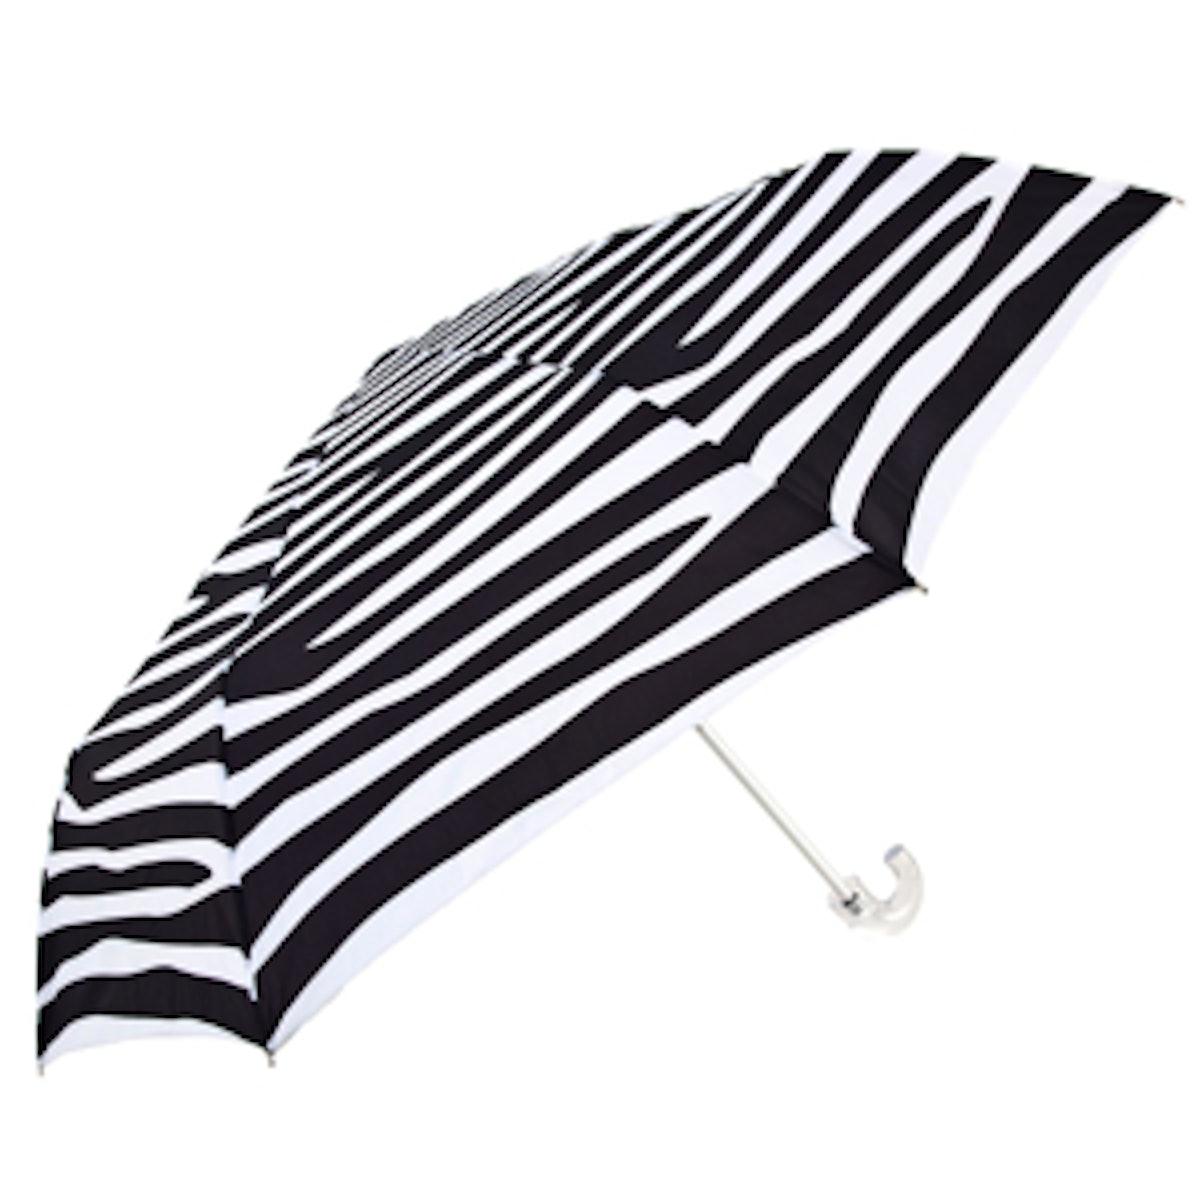 Umbrella in Zebra